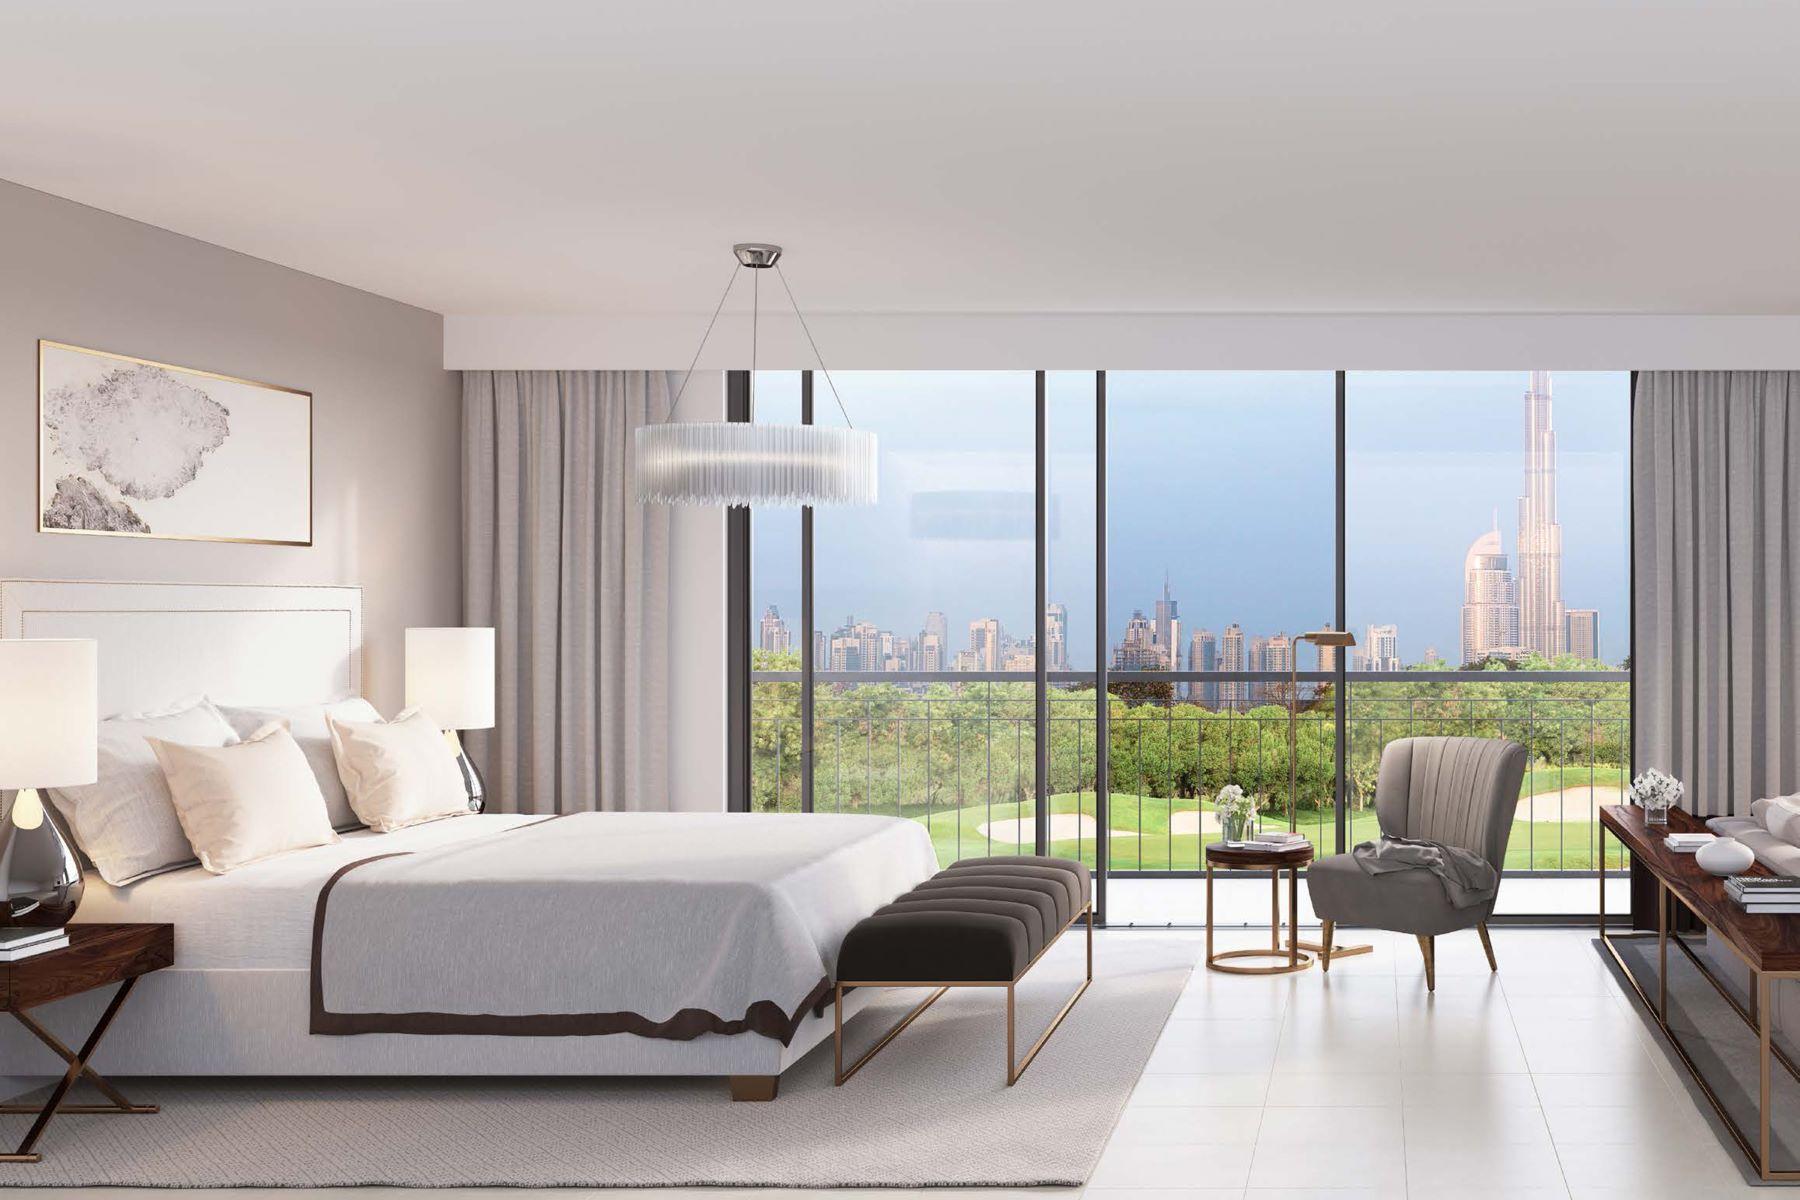 Other Residential Homes for Sale at The Fairway Vistas Dubai Hills 6 Bedroom. Dubai, Dubai United Arab Emirates